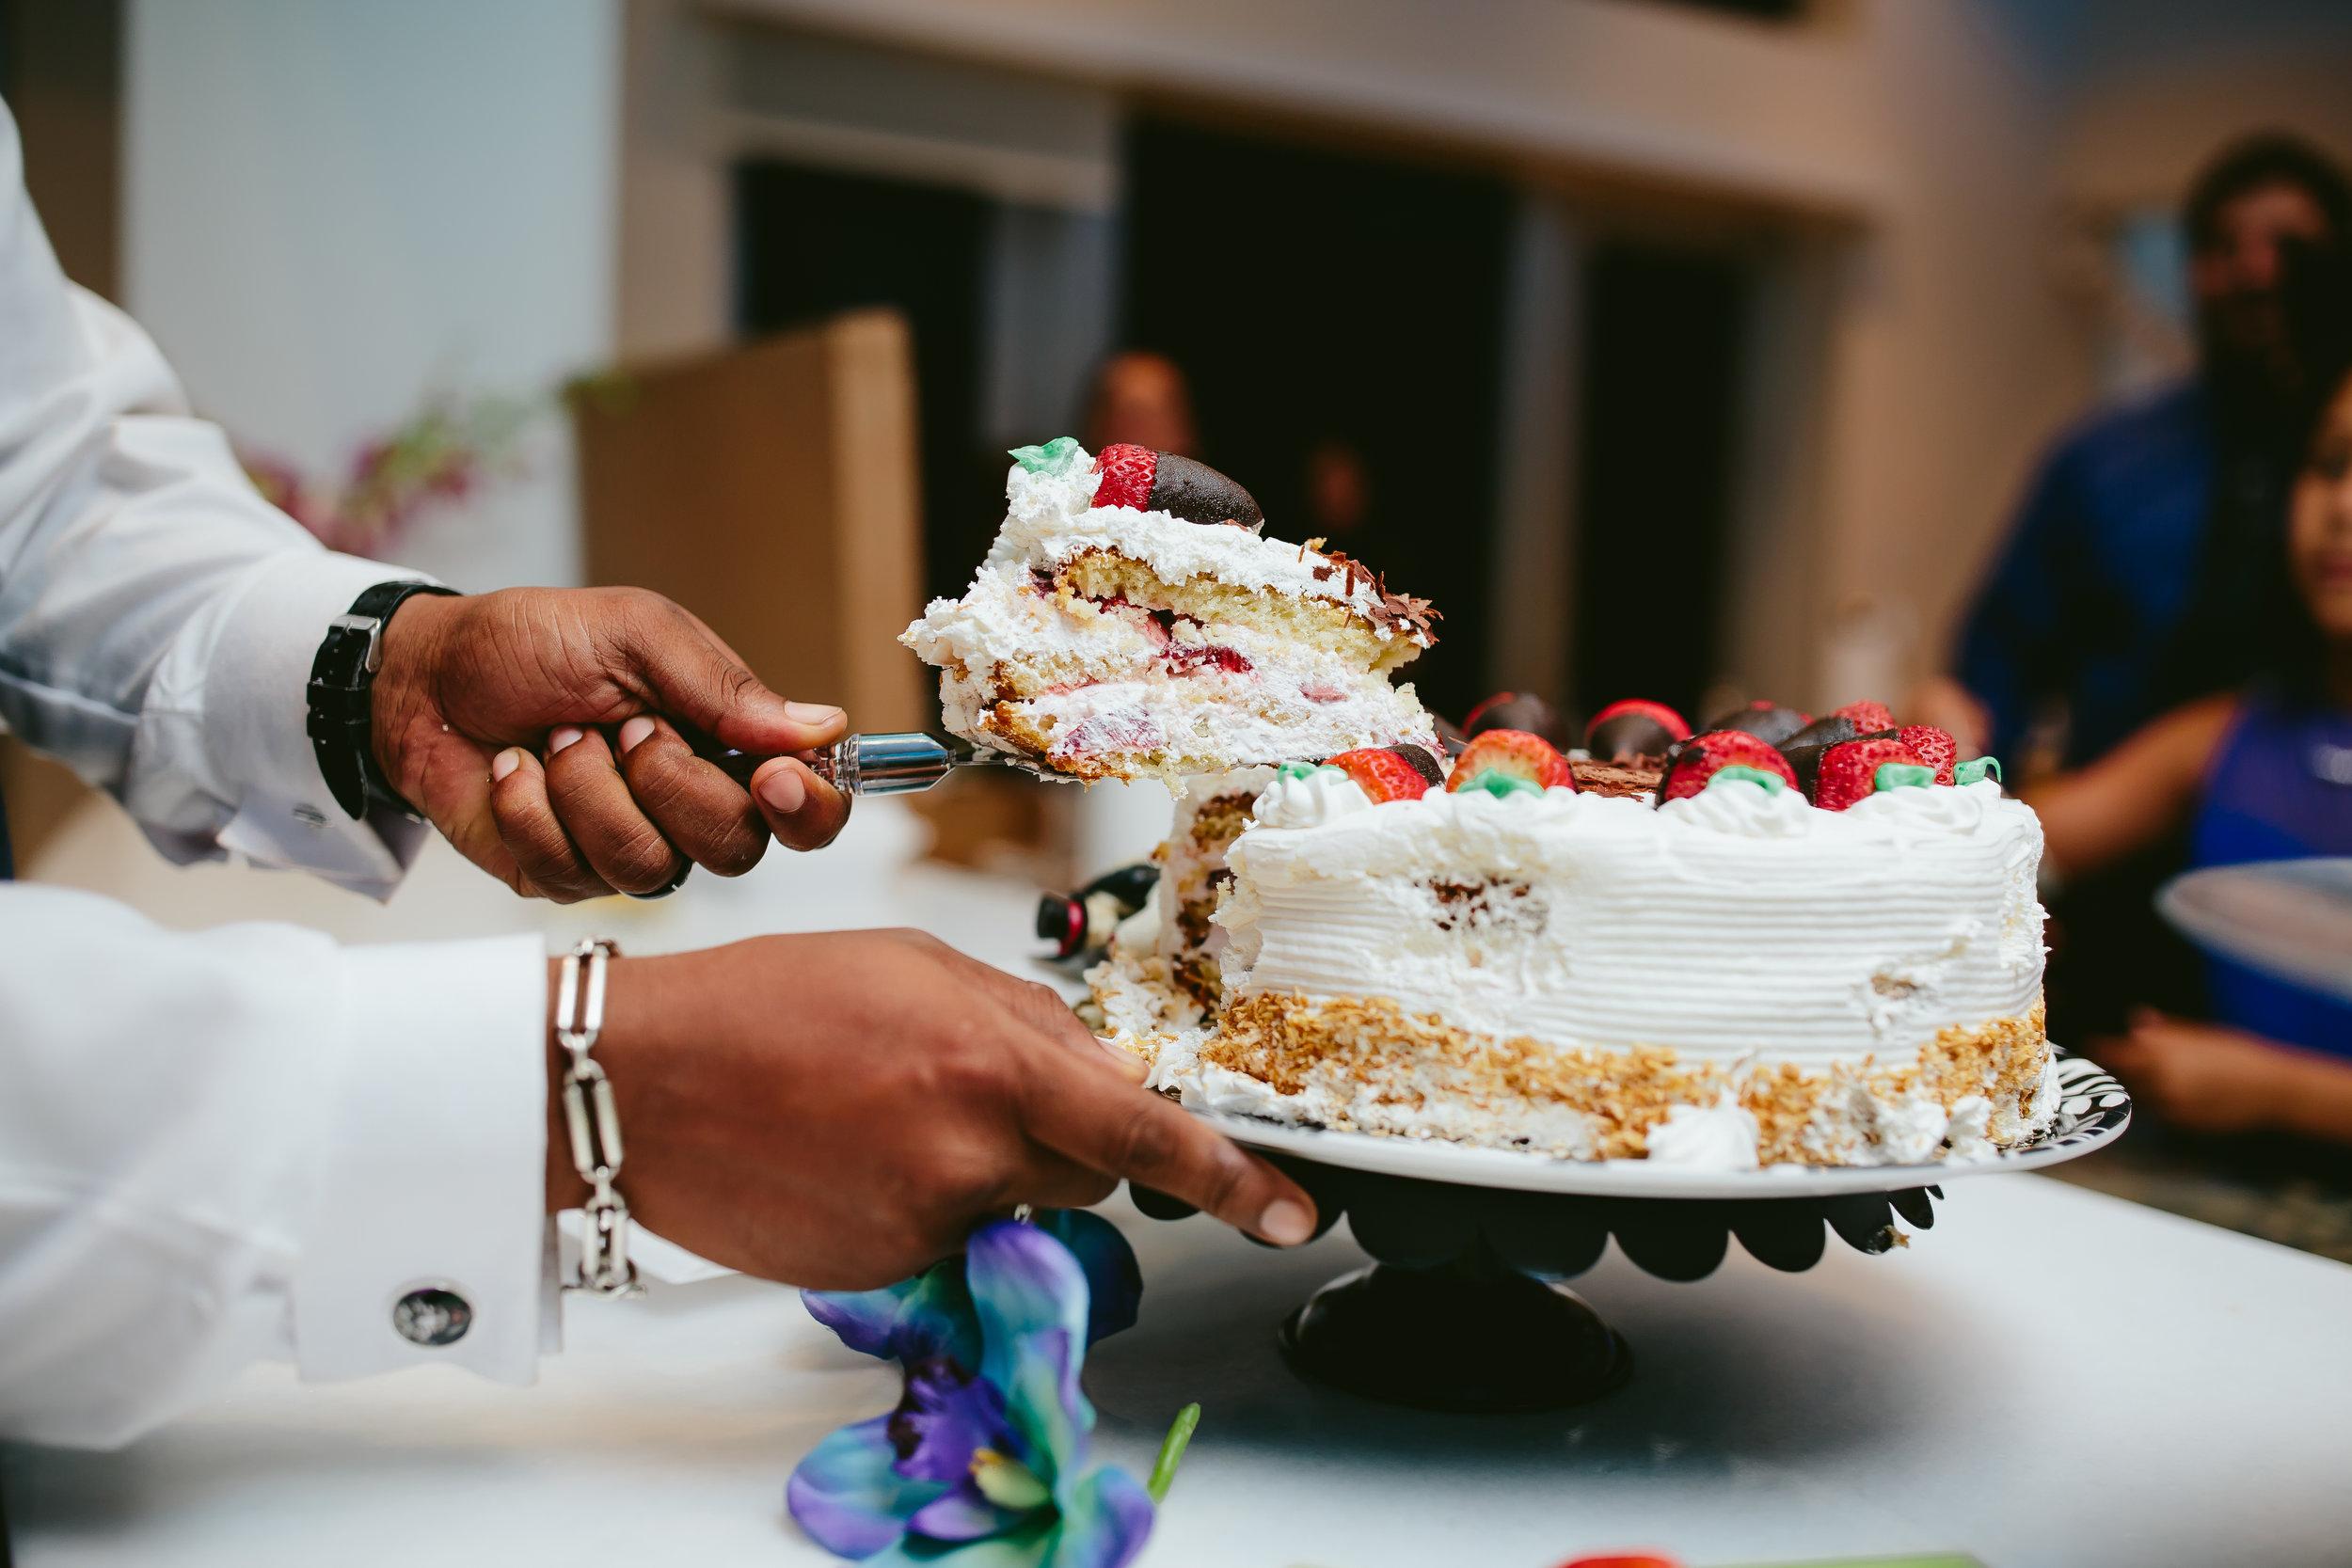 wedding-cake-cutting-tiny-house-photo-south-florida-wedding-photographer.jpg